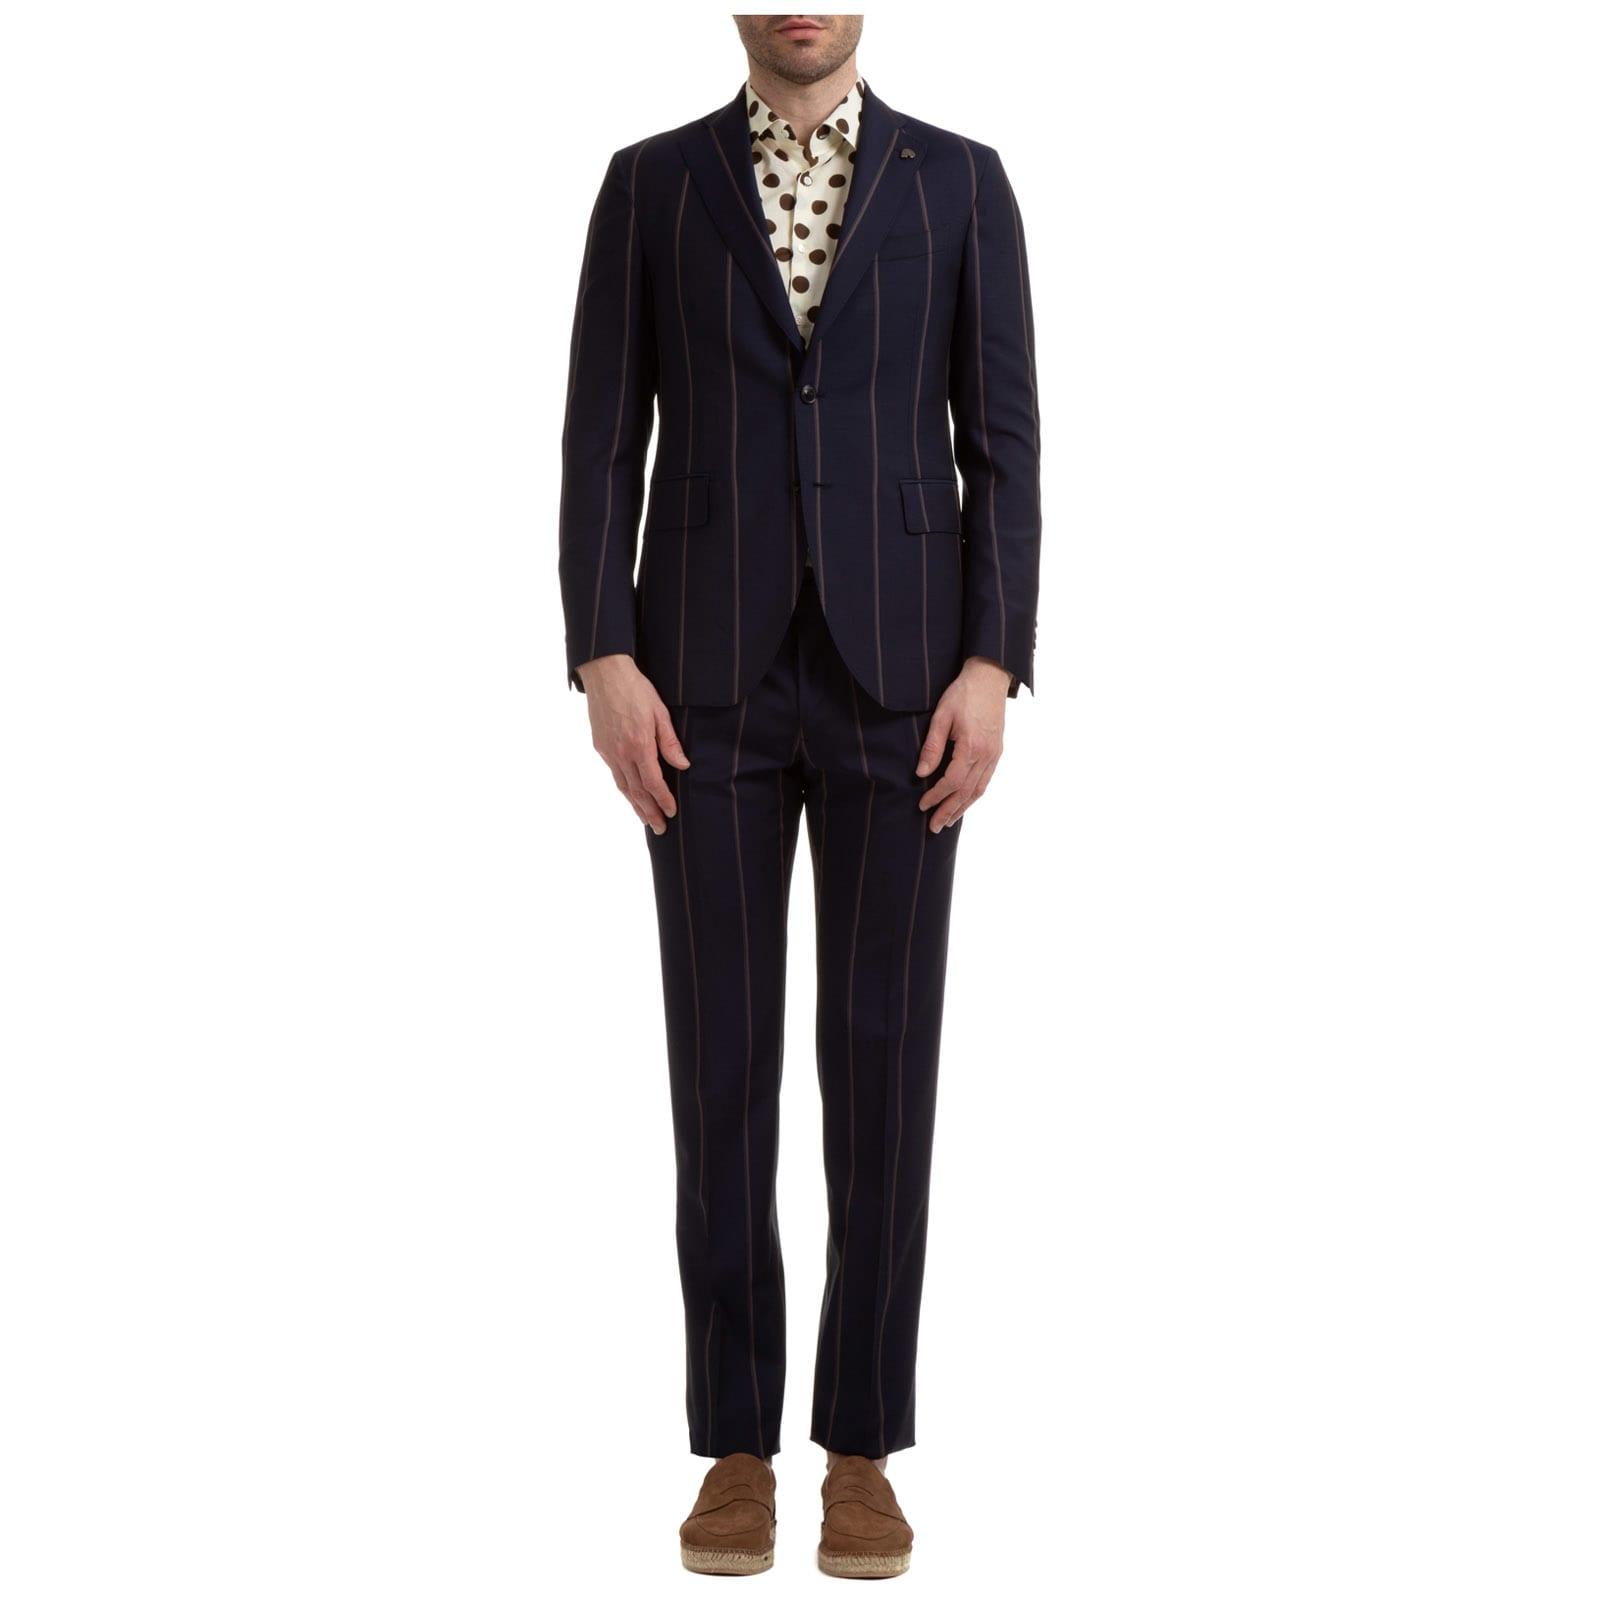 Montecarlo Suits